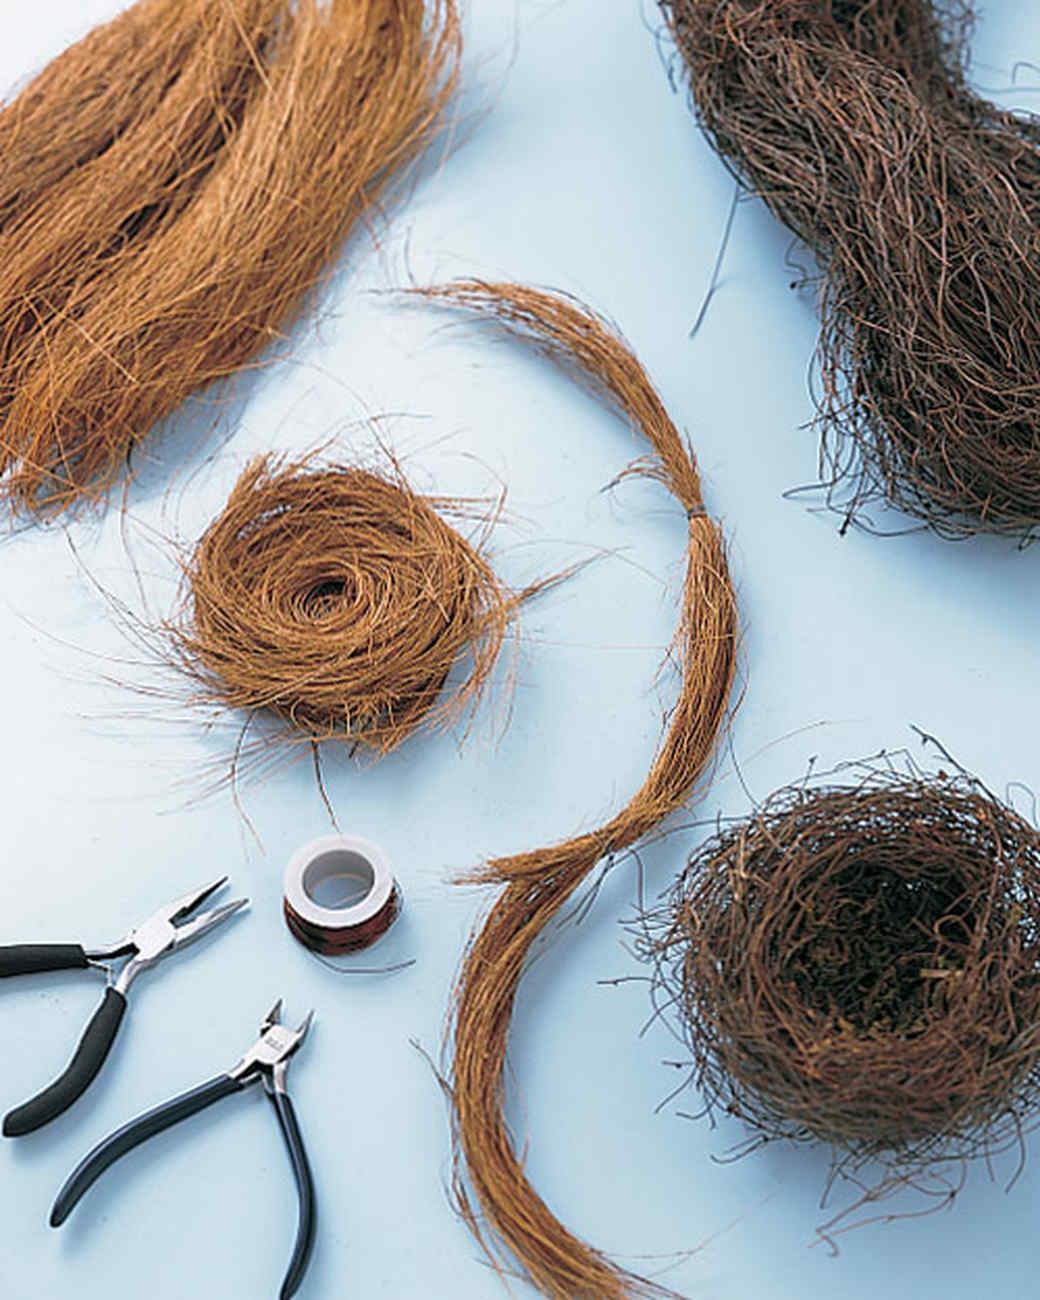 Coconut Fiber Or Grapevine Nests Martha Stewart